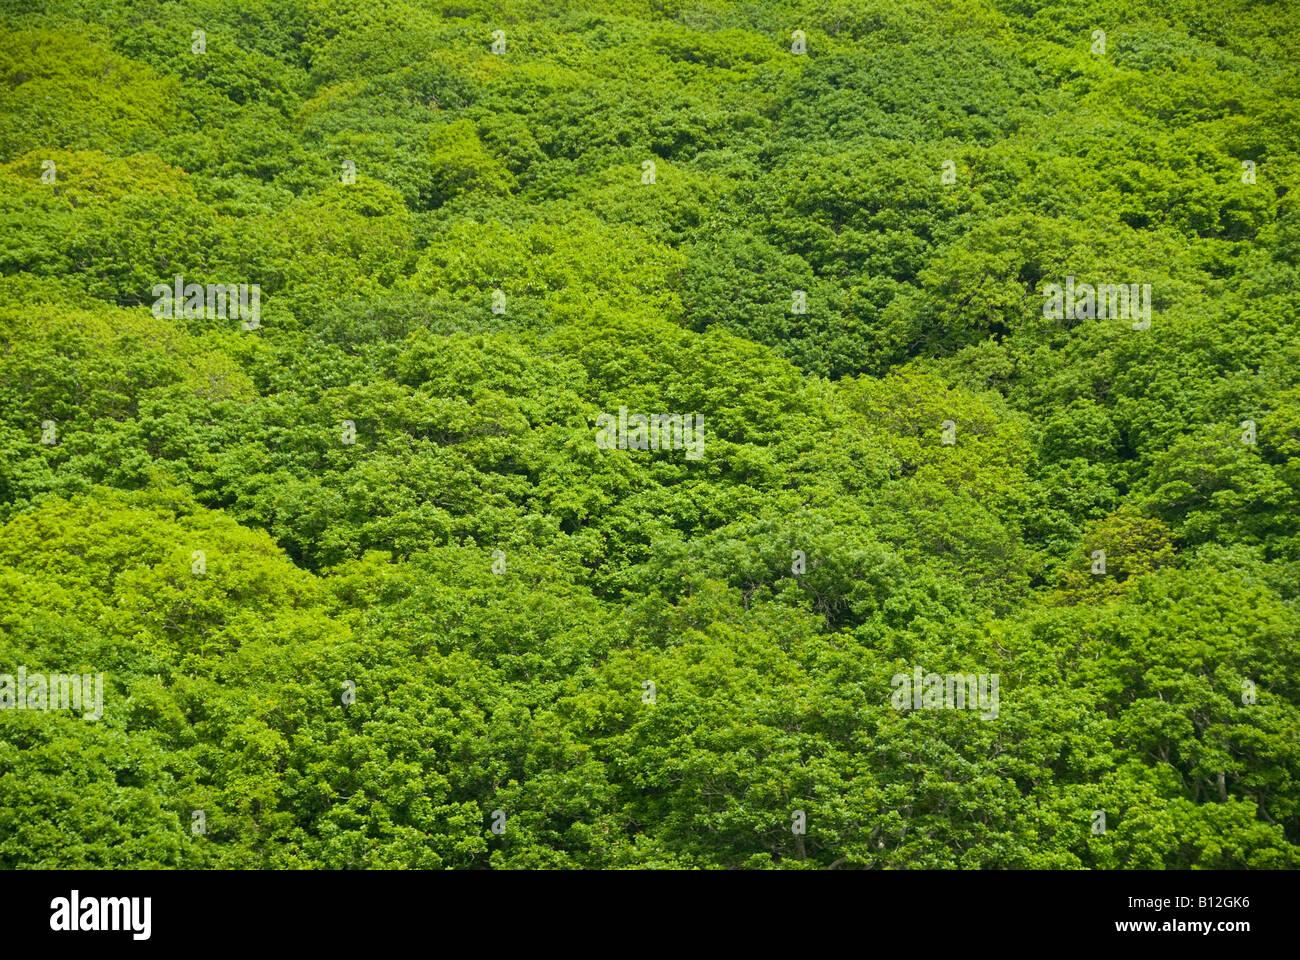 Árbol verde dosel de árboles de roble en Gran Bretaña Imagen De Stock